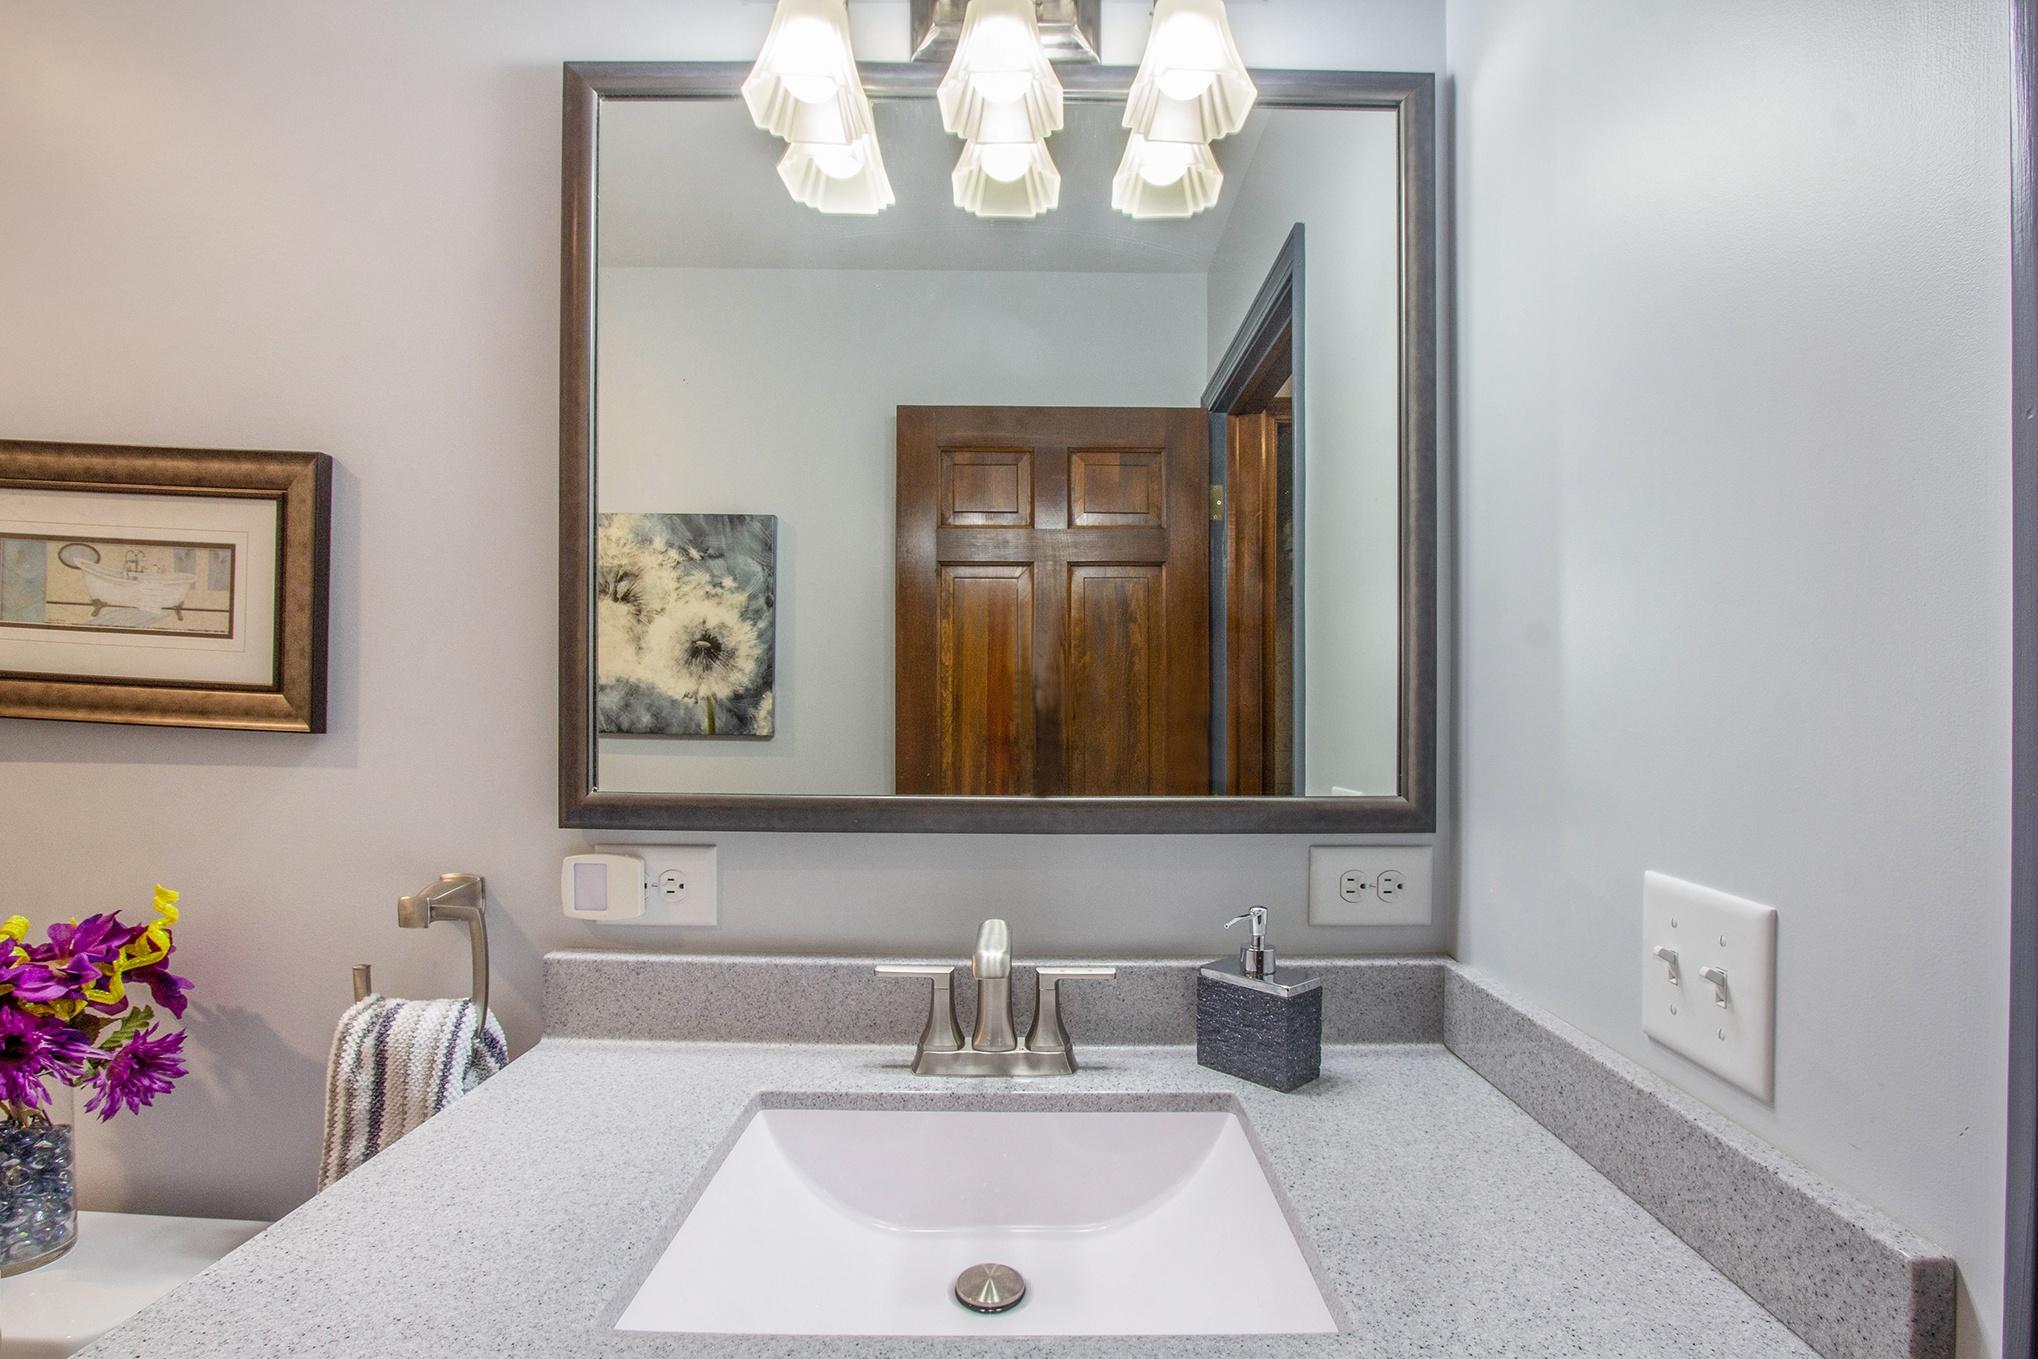 GroveBluff Sink and Mirror